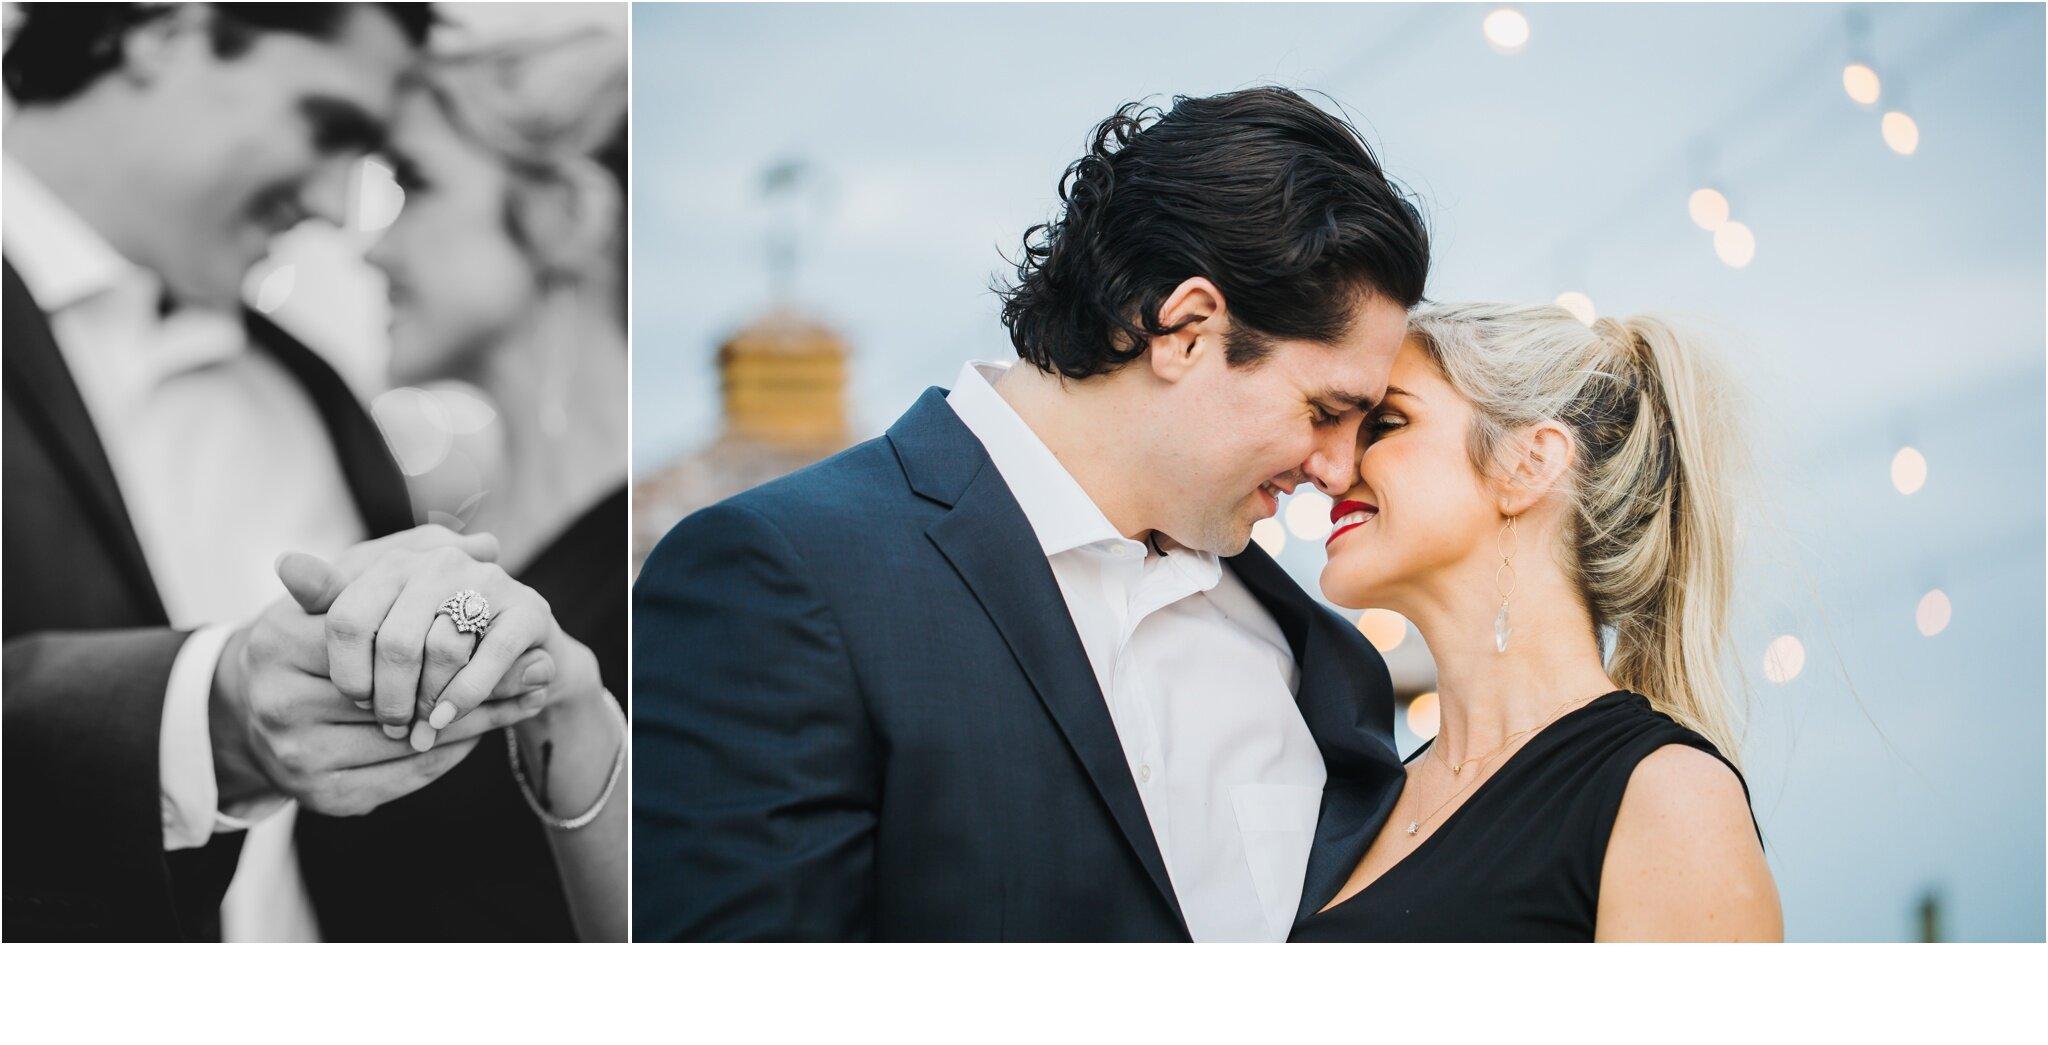 Rainey_Gregg_Photography_St._Simons_Island_Georgia_California_Wedding_Portrait_Photography_1853.jpg